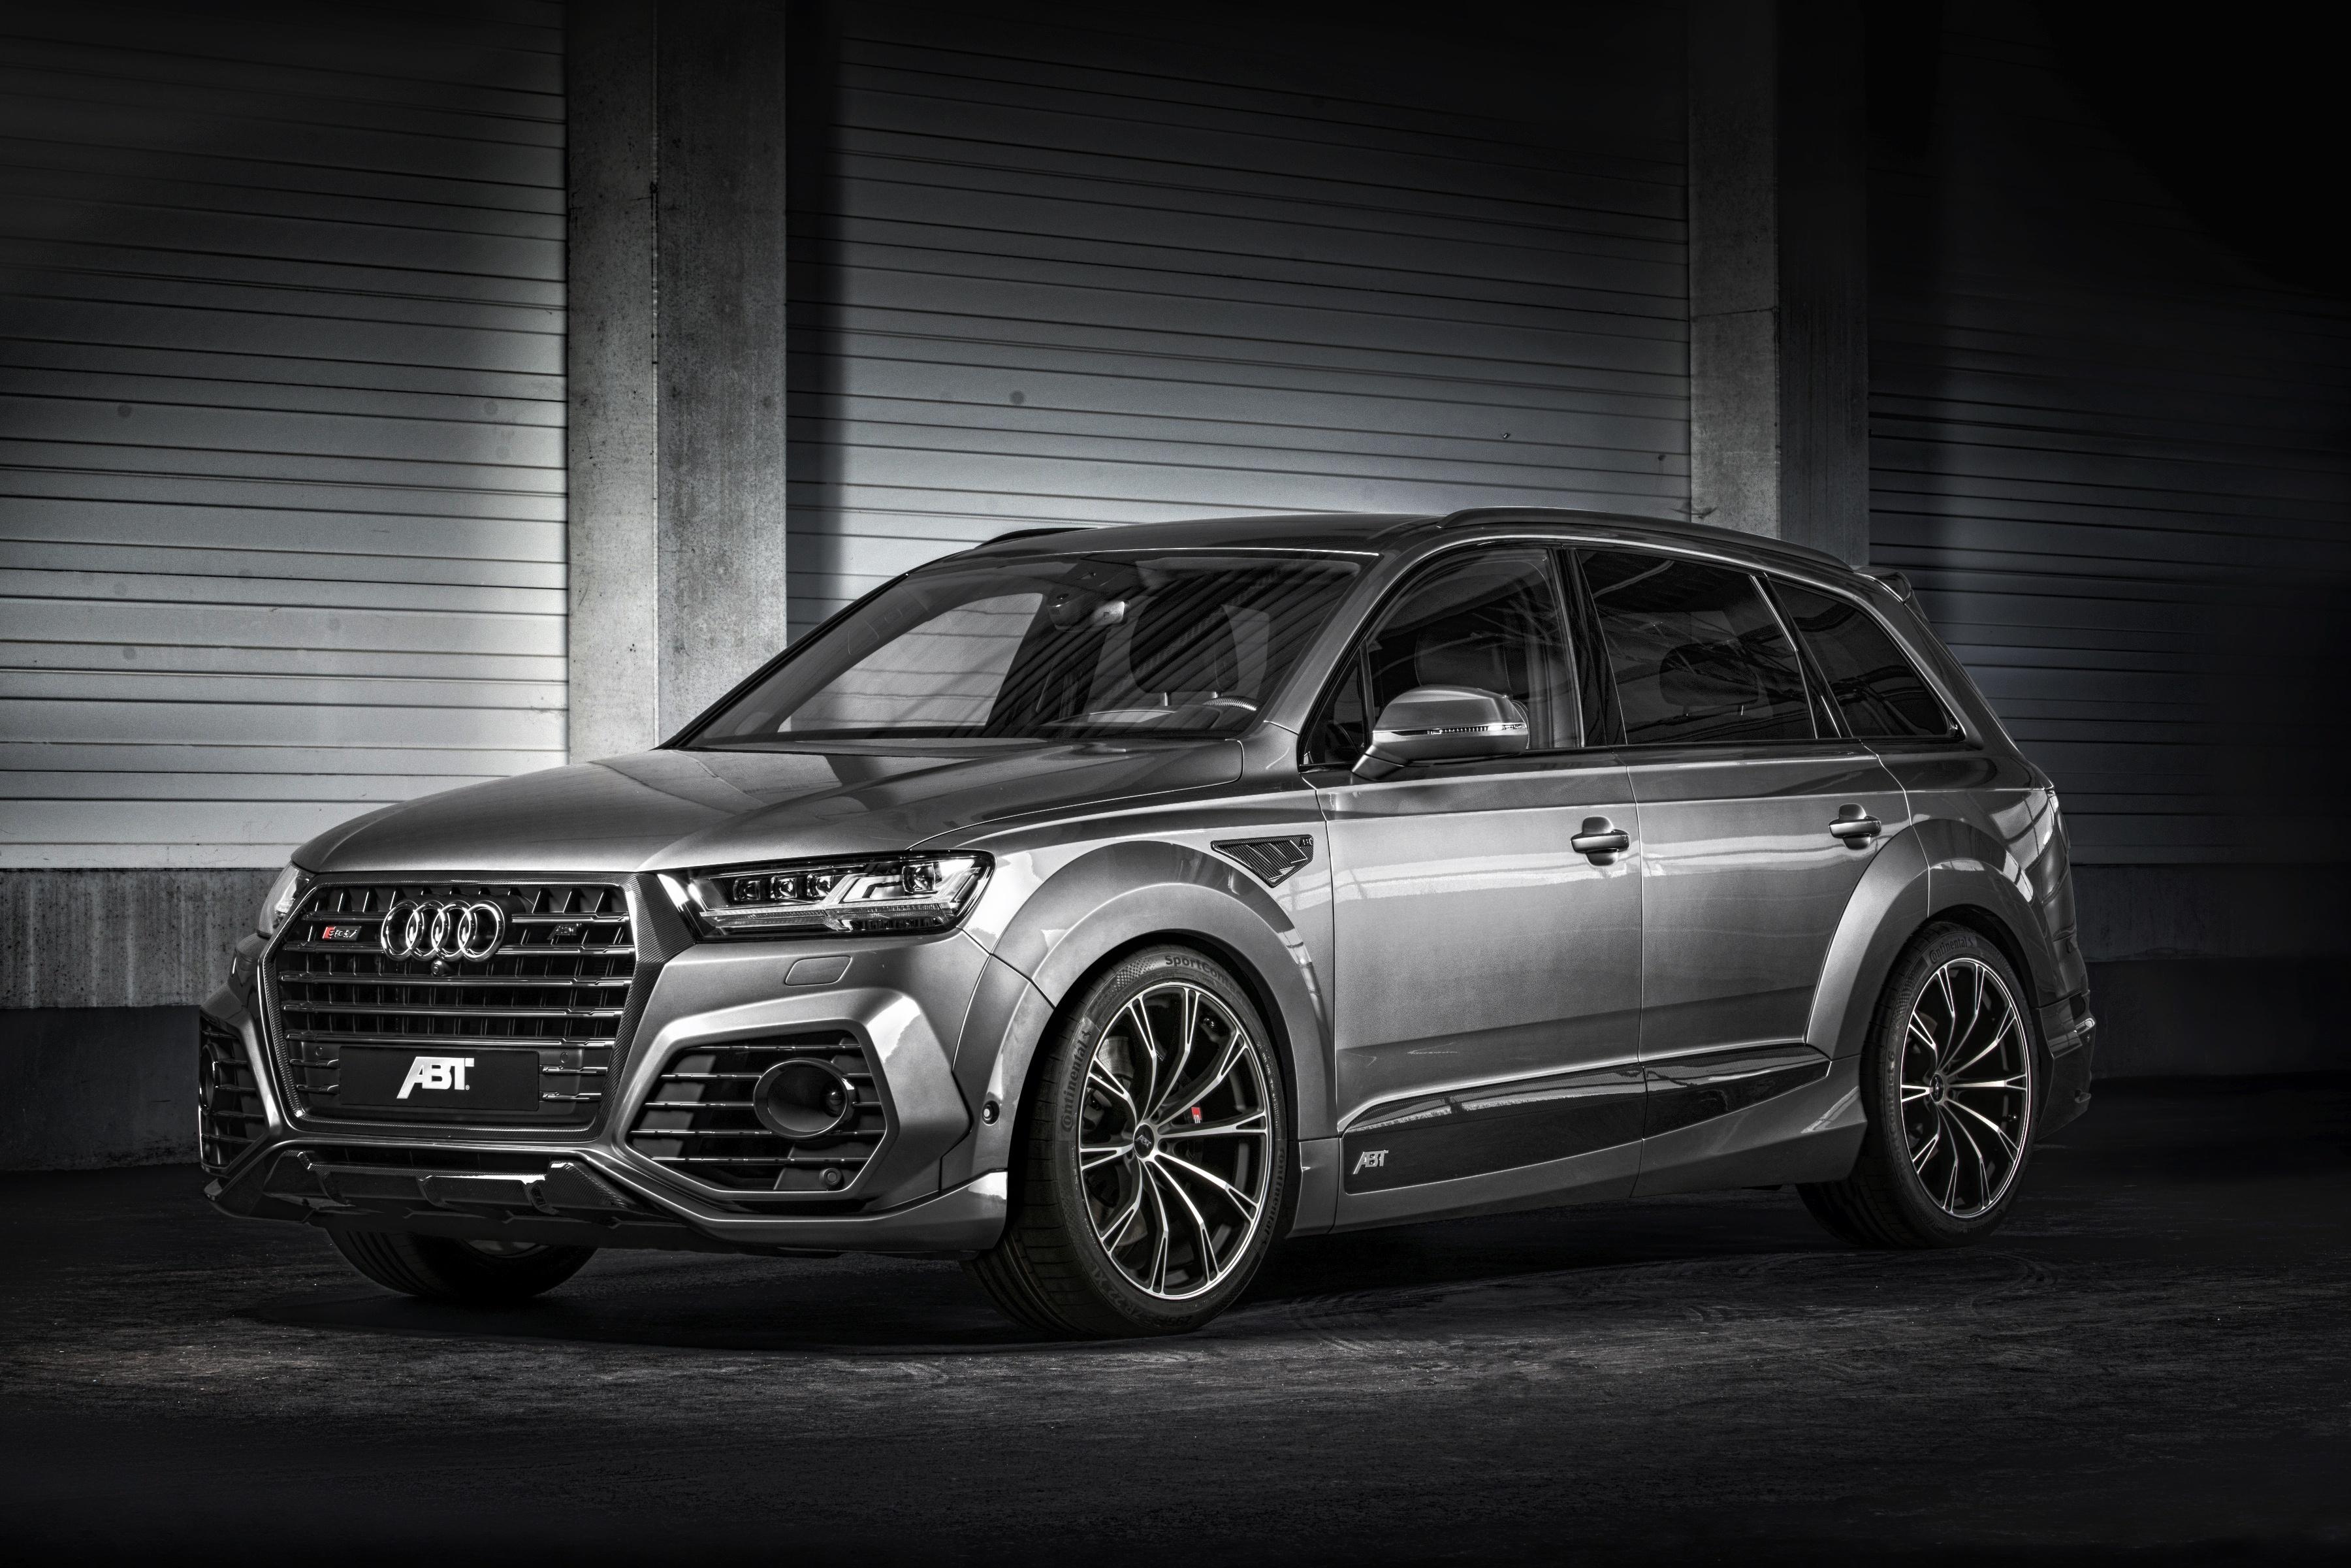 Audi Q7 Hd Wallpaper Background Image 3600x2401 Id 809620